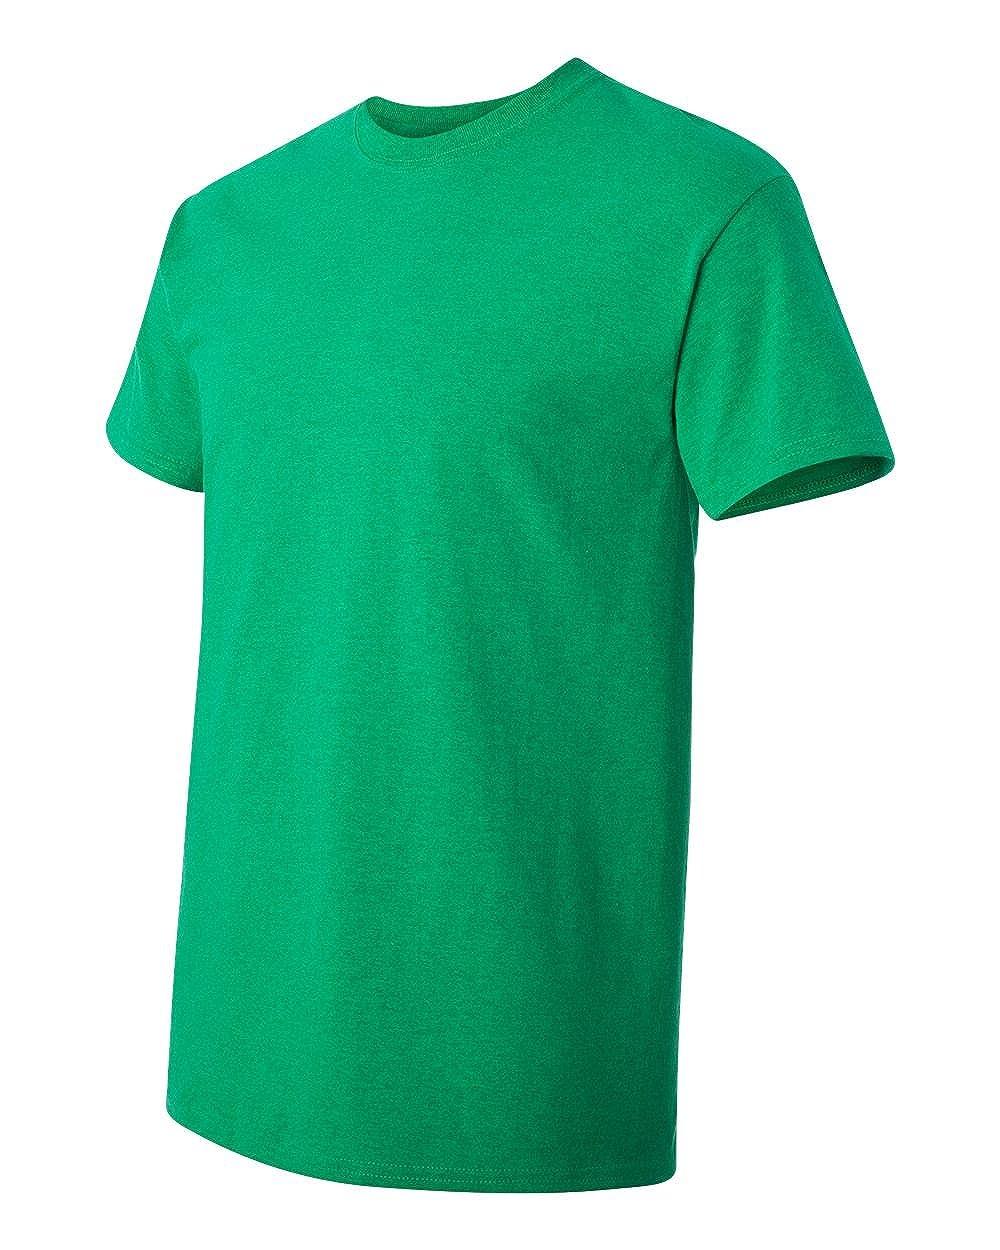 Gildan Mens Seamless Double Needle Preshrunk T-Shirt